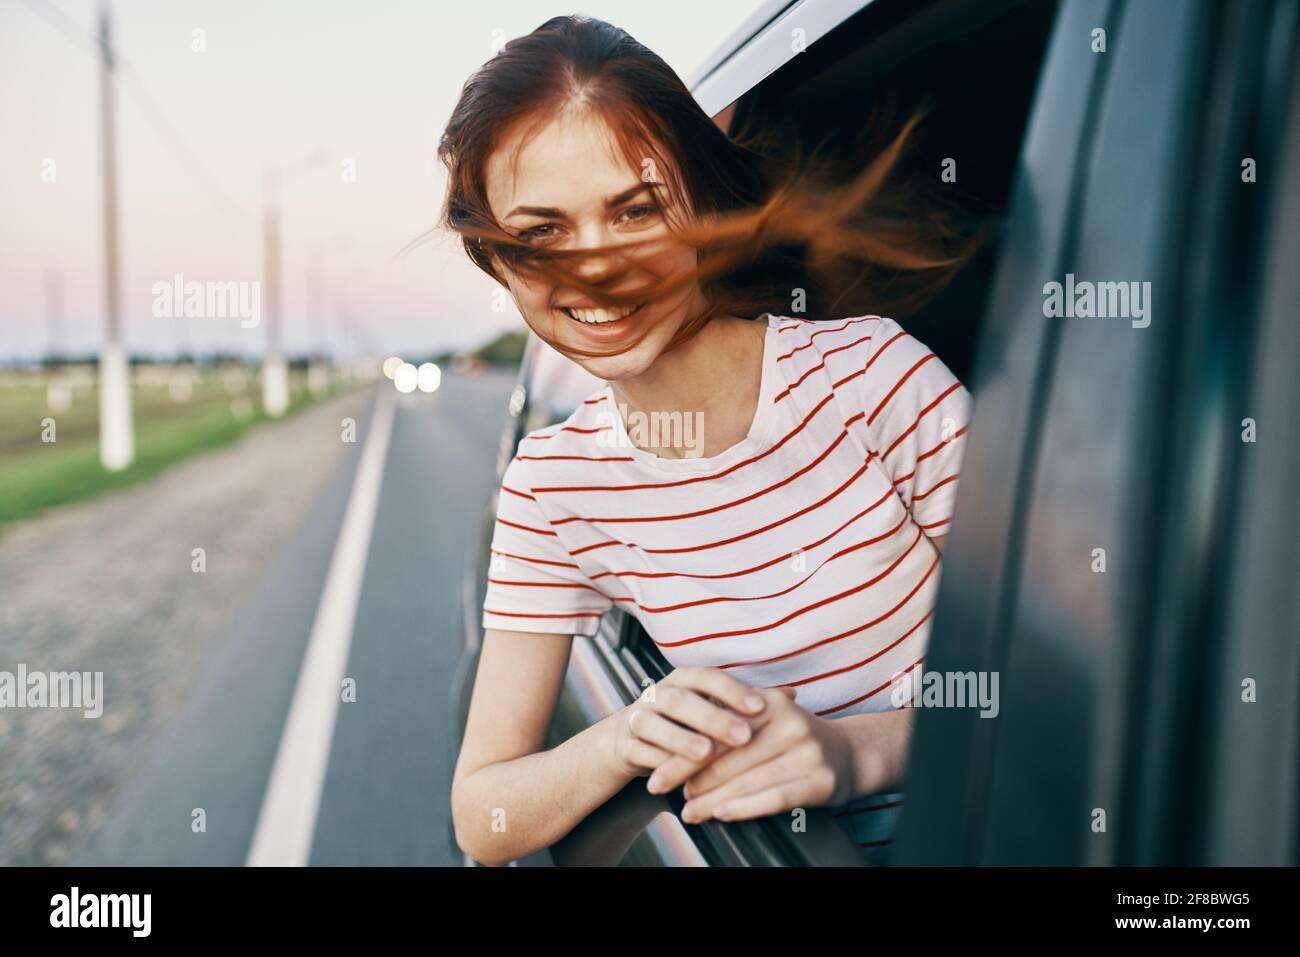 woman in striped t-shirt red hair car window salon model Stock Photo